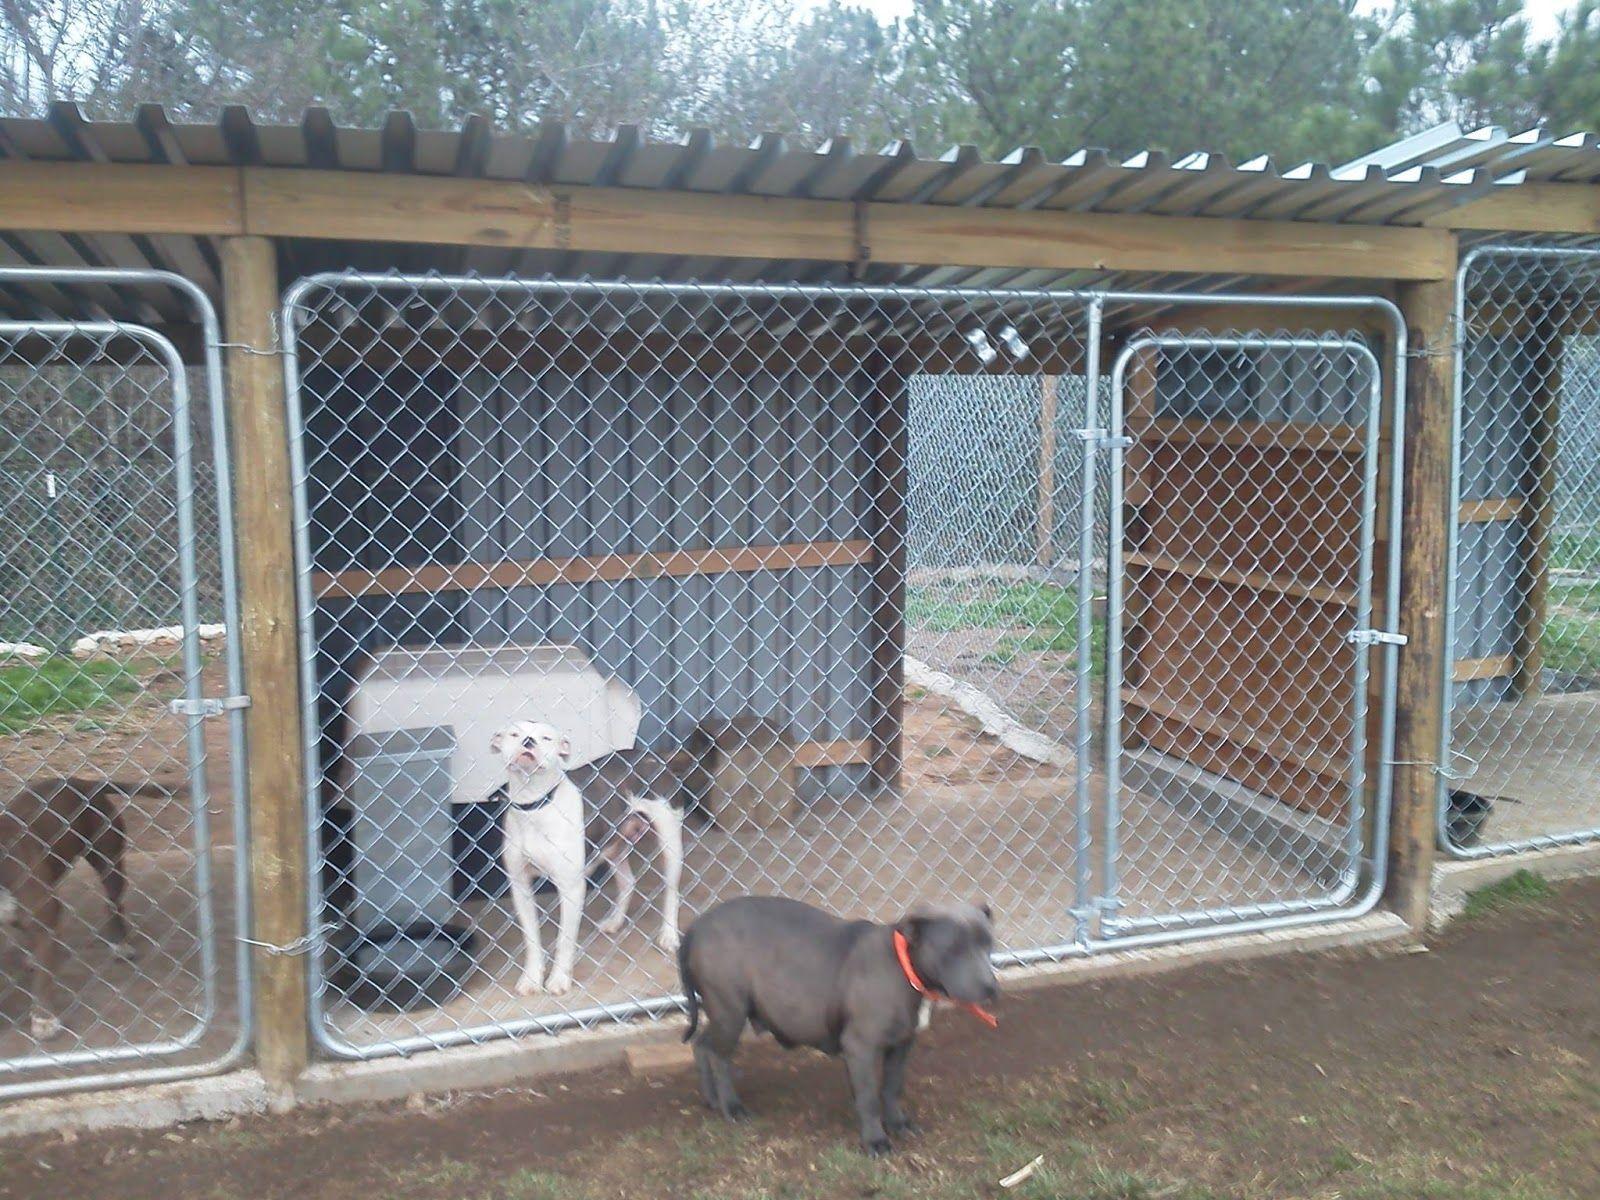 30 Clever Designs Of How To Build Backyard Dog Kennel Ideas Simphome Diy Dog Kennel Dog Boarding Kennels Dog Backyard